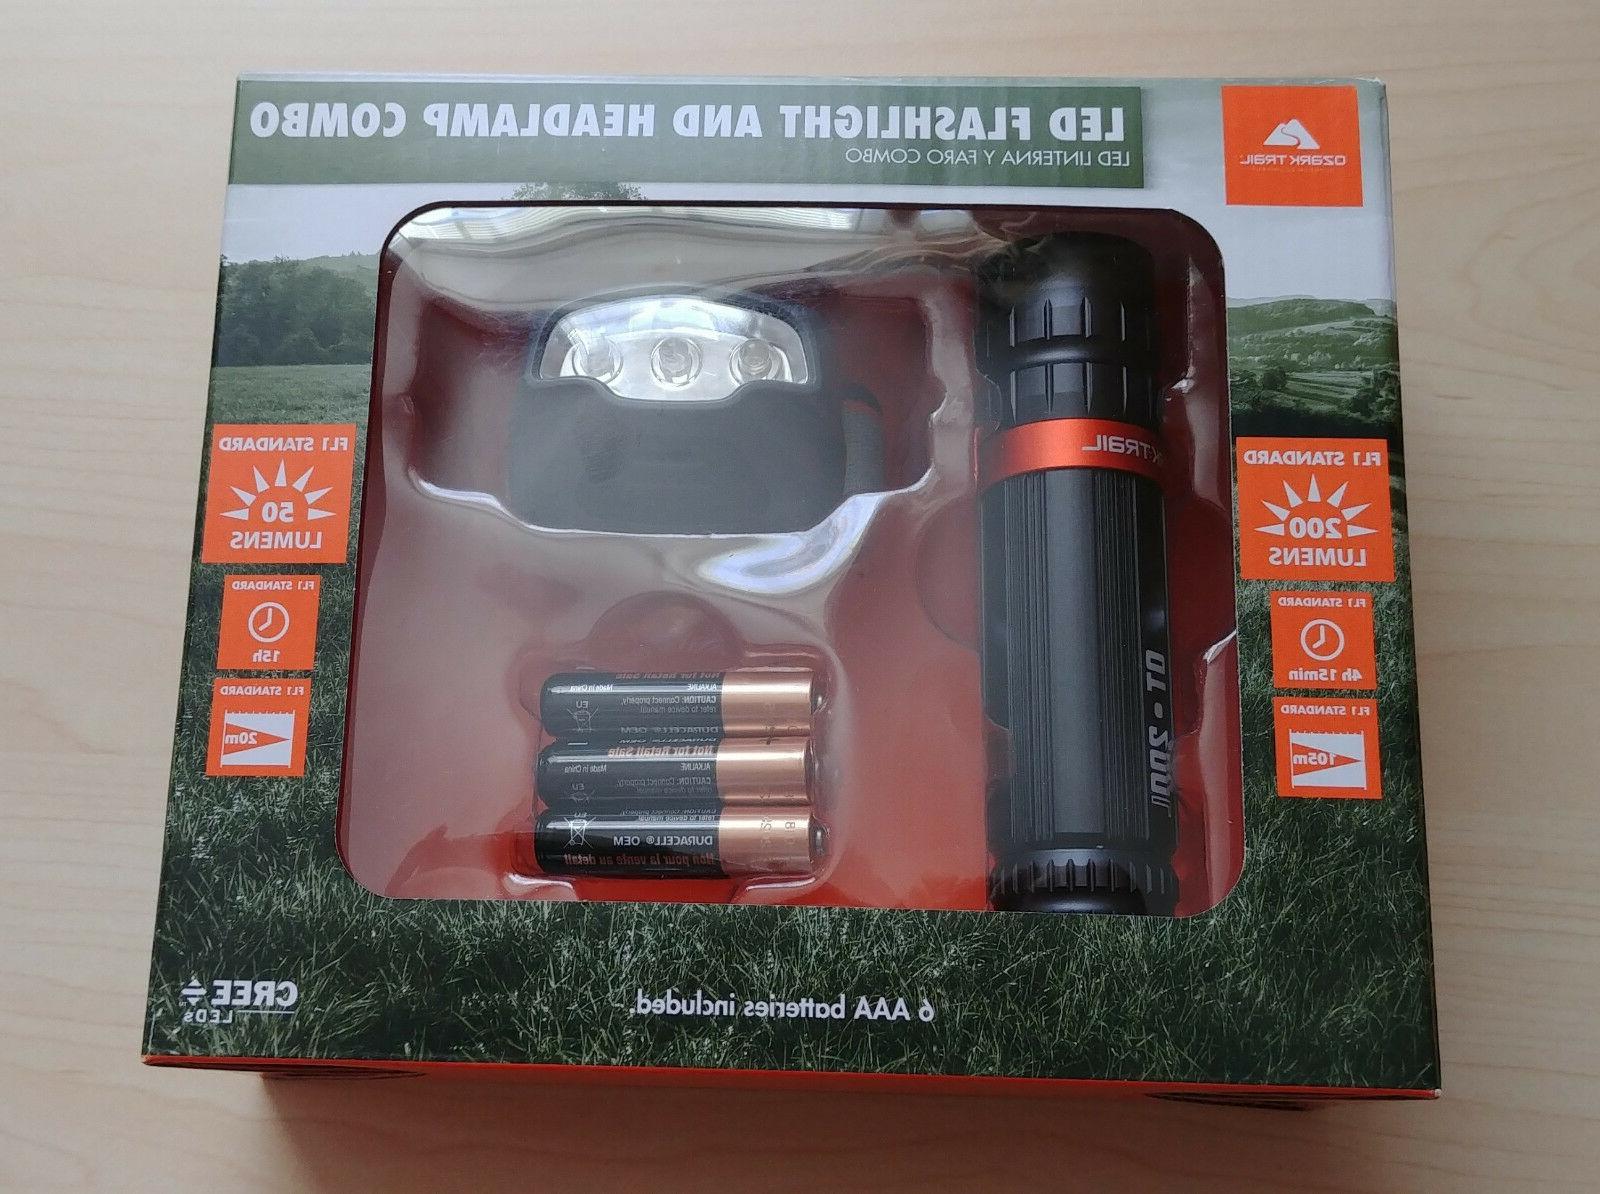 200 lumens cree led flashlight and 50l